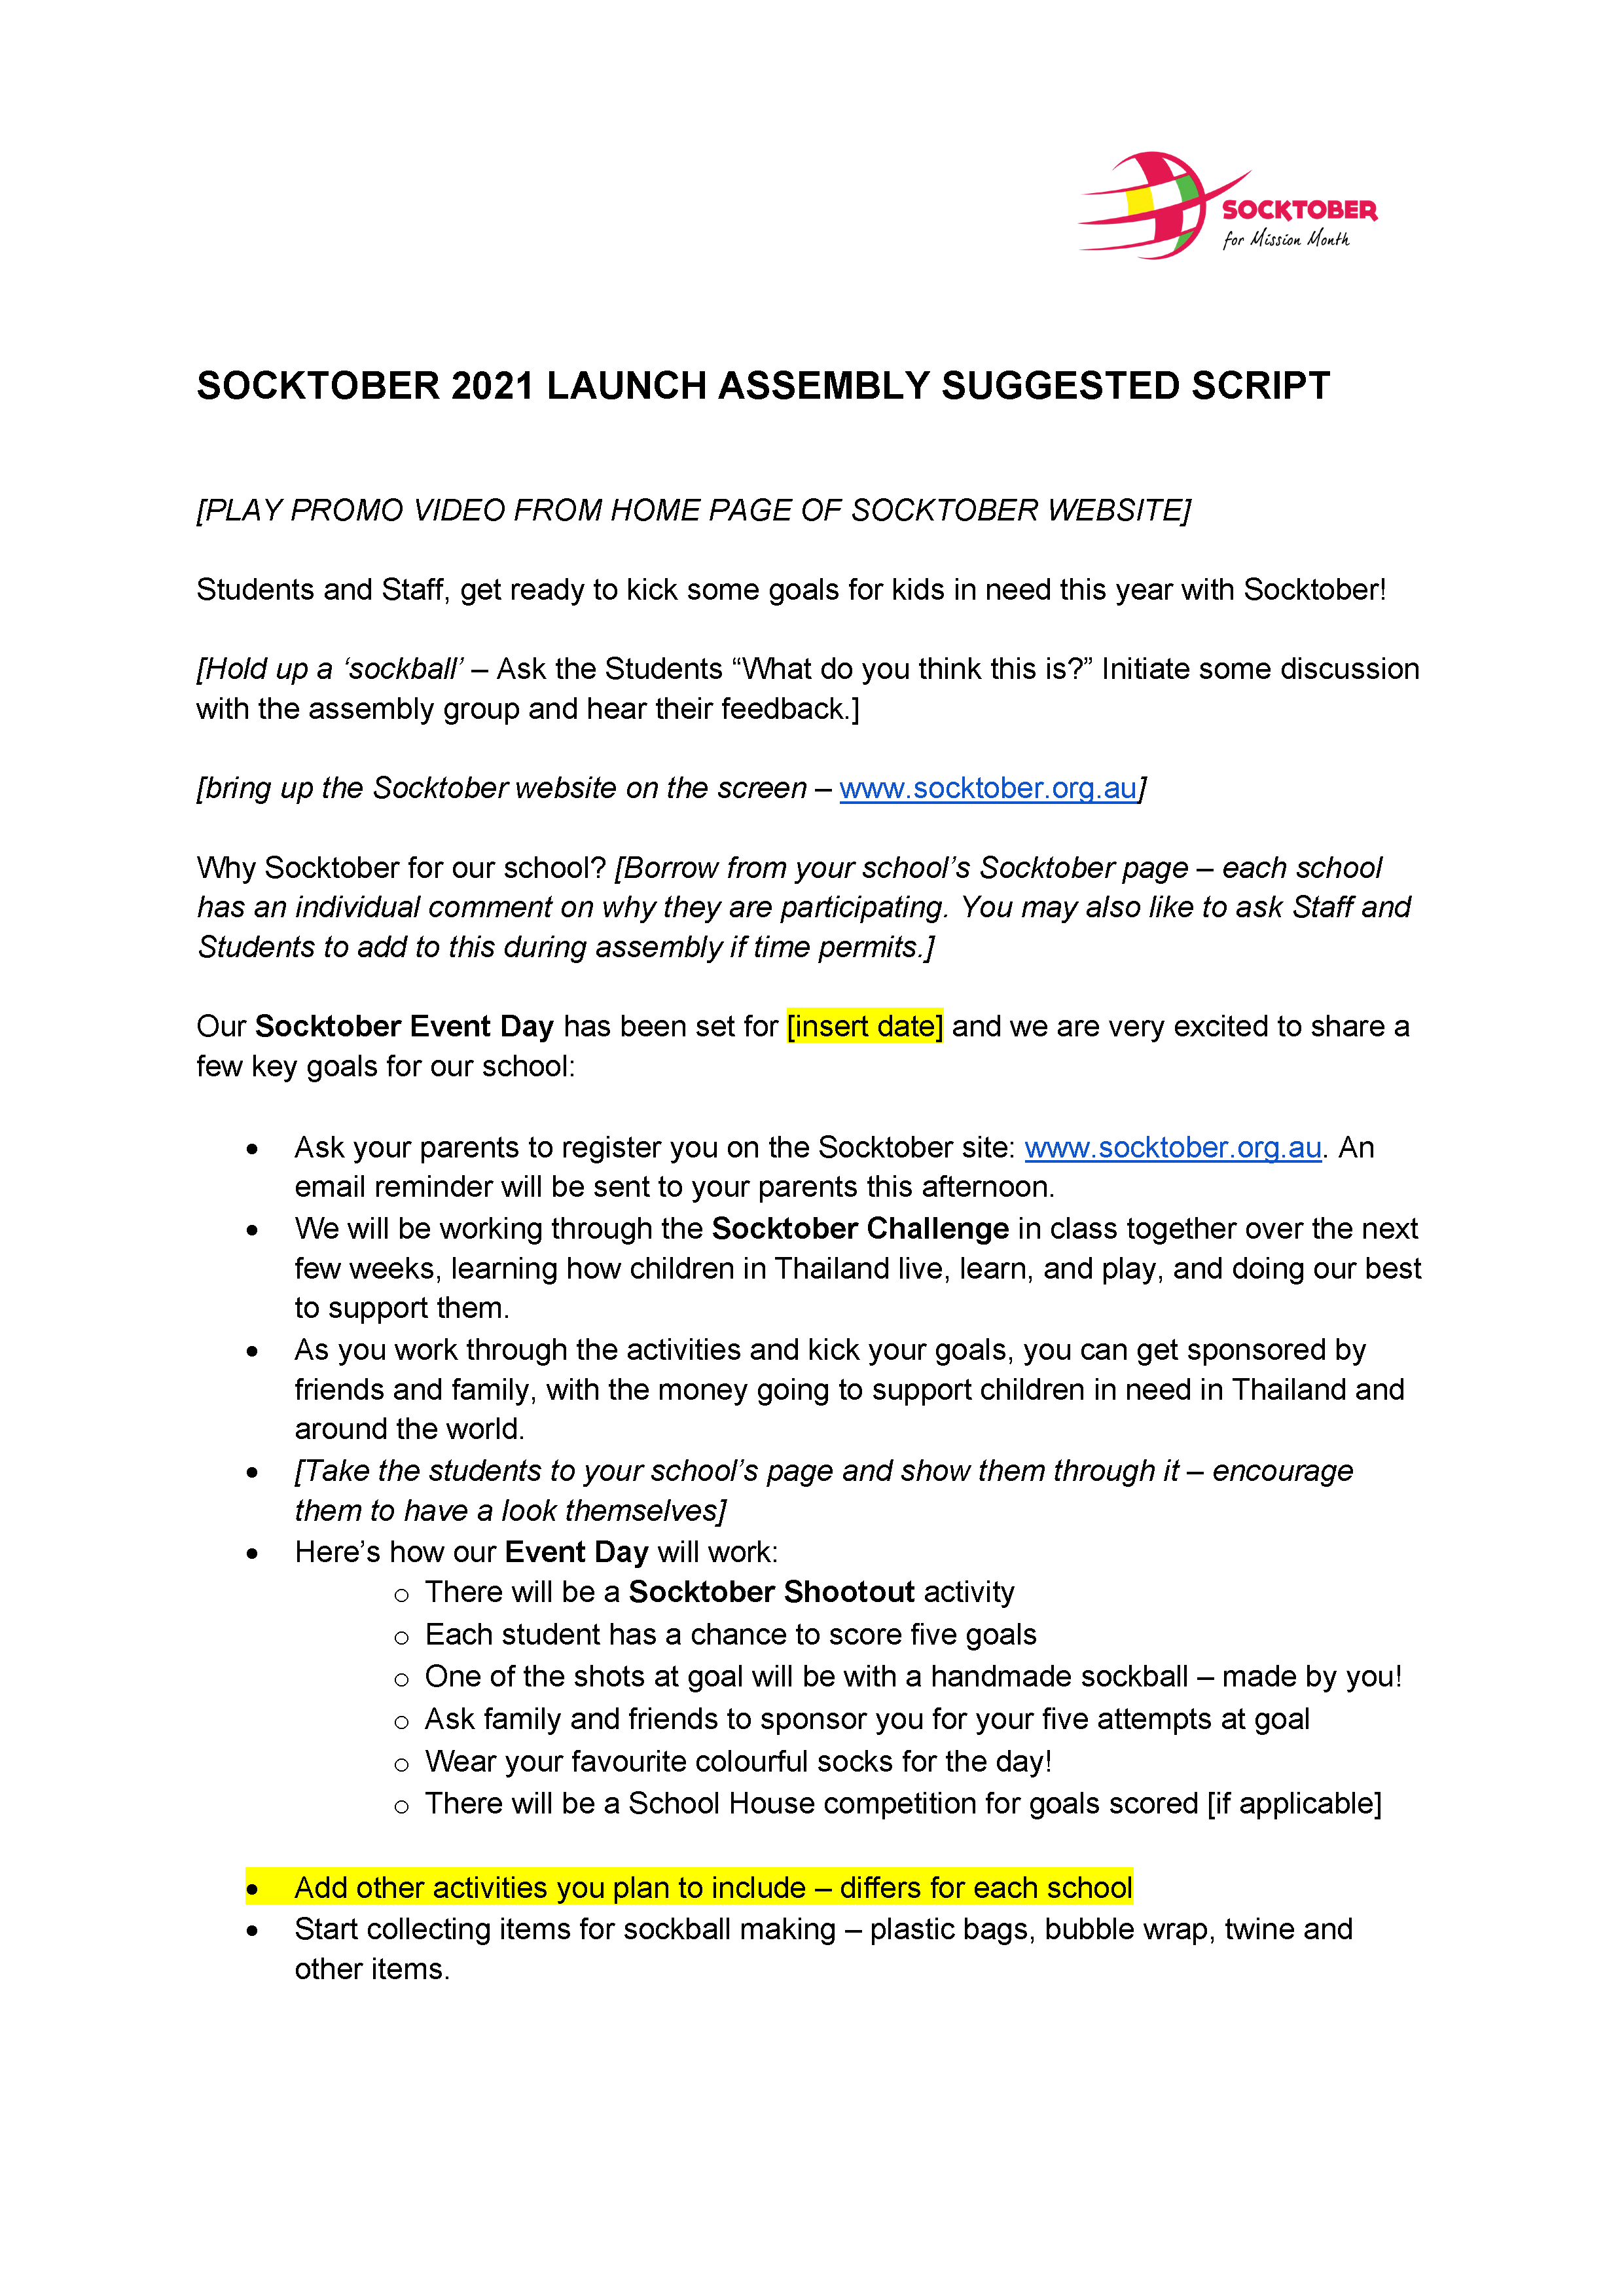 Launch Assembly Script